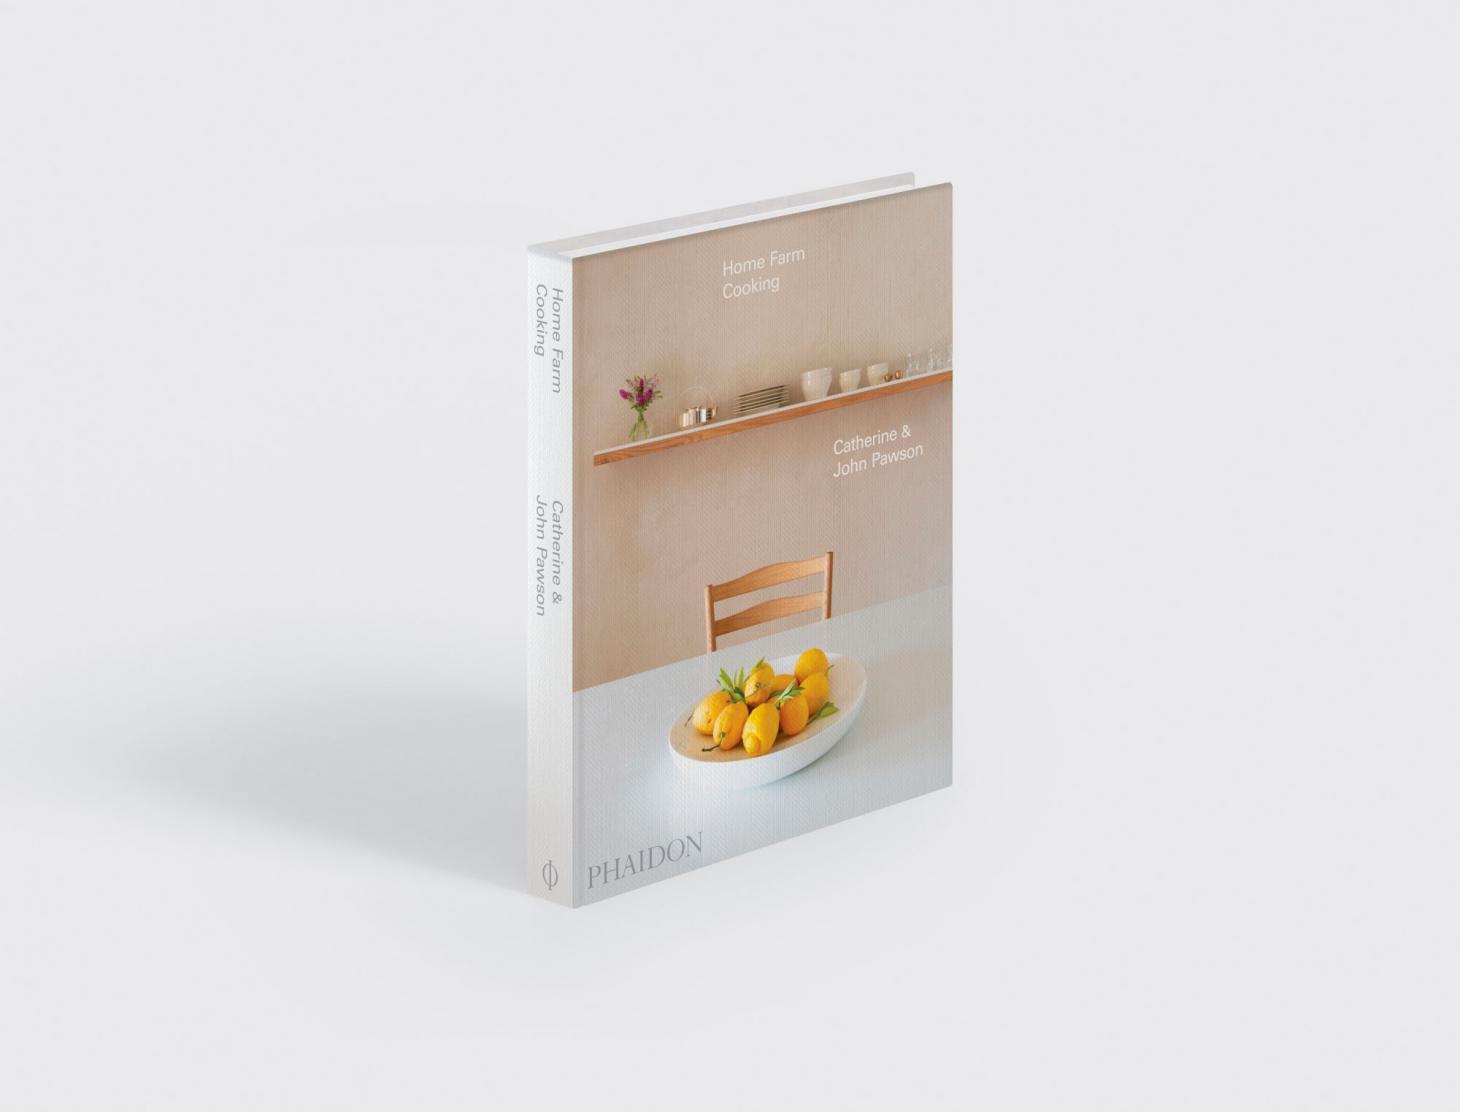 novo livro receitas; John Pawson